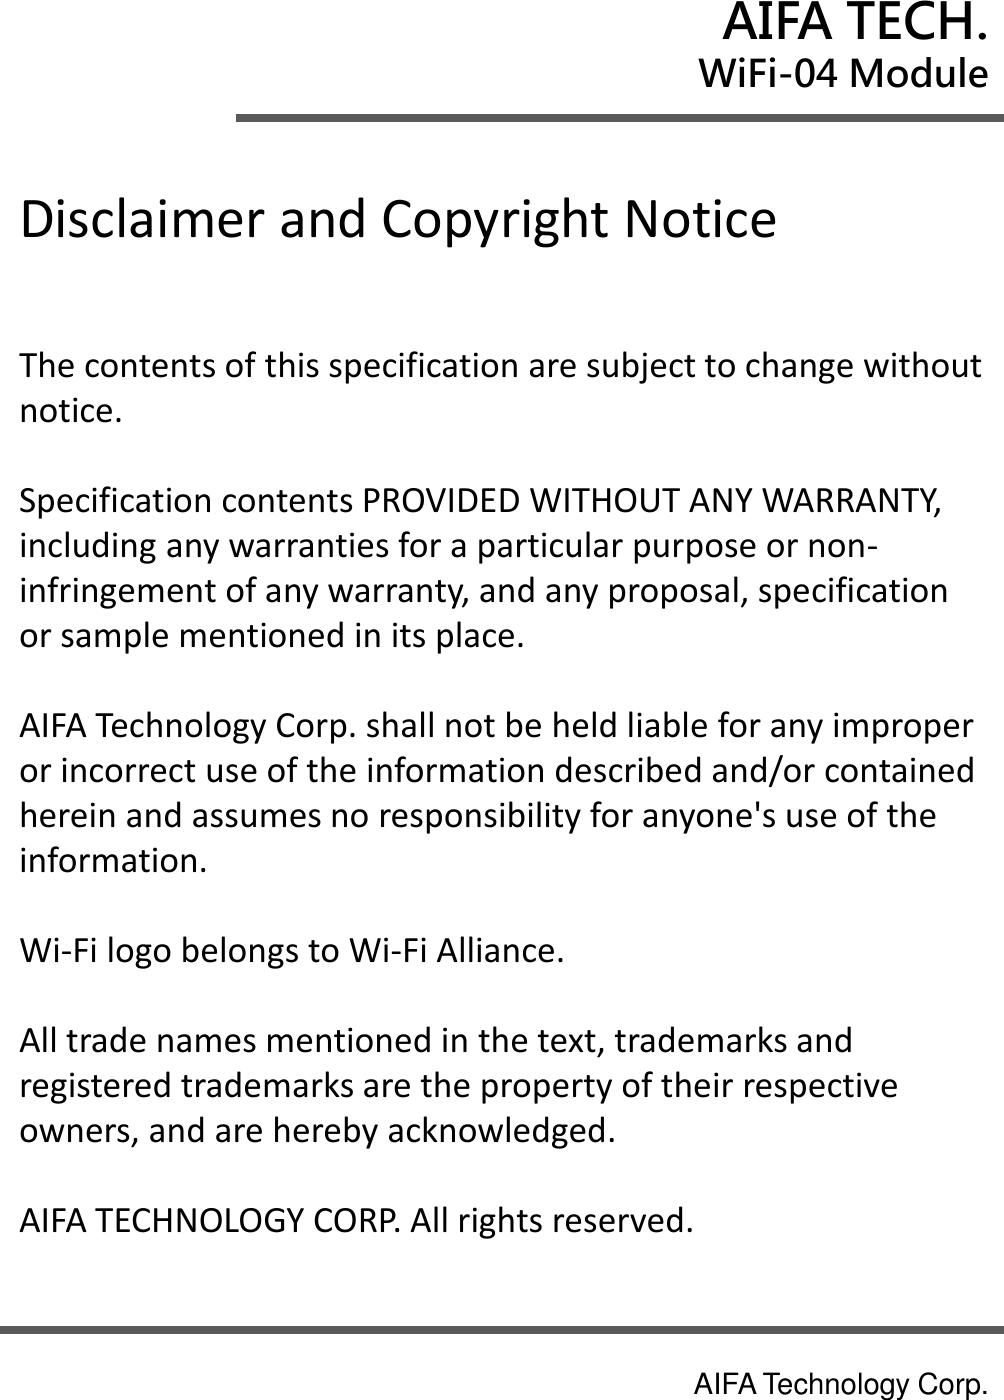 AIFA TECHNOLOGY WIFI-04 WiFi Module User Manual PowerPoint